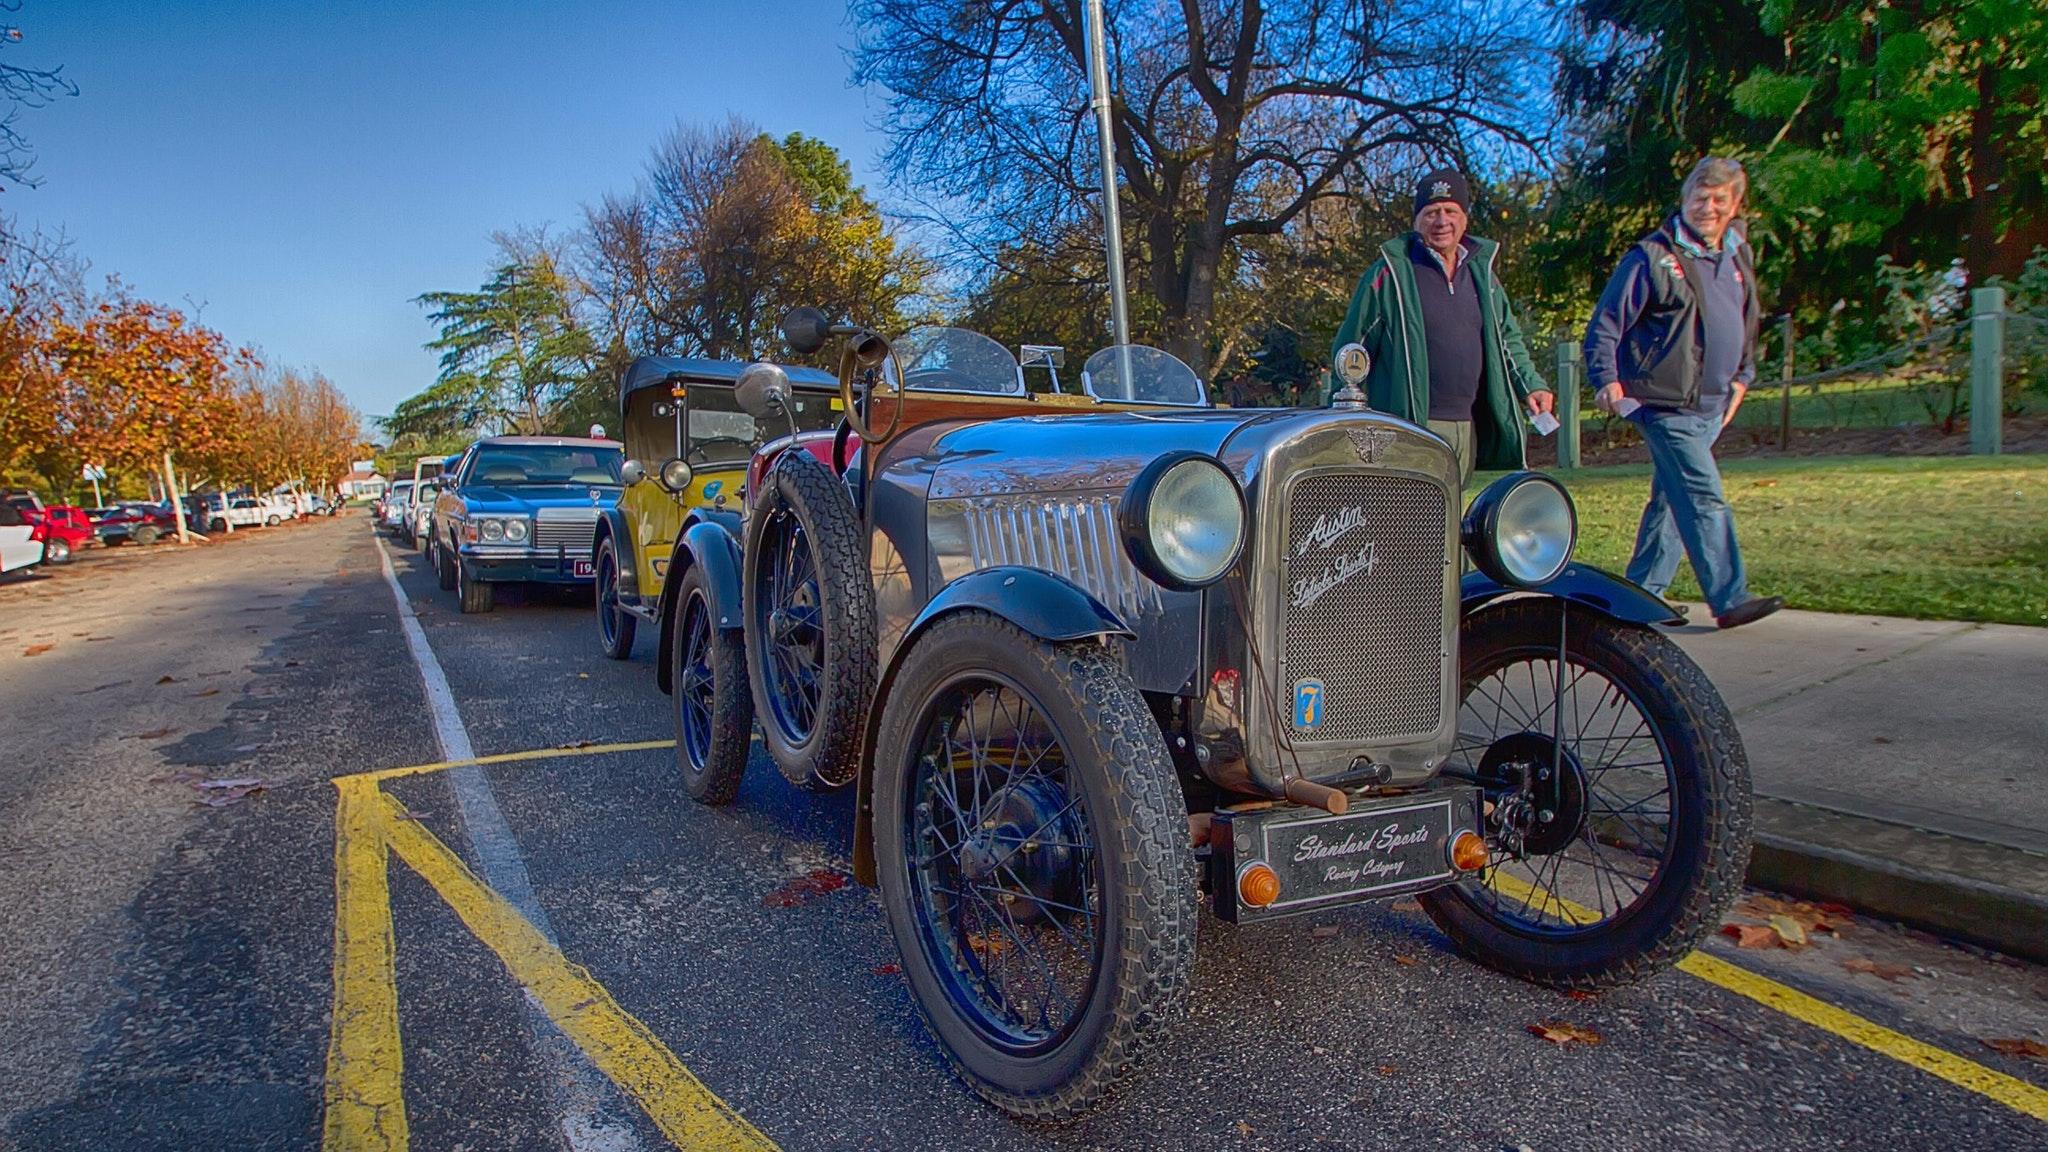 Benalla and District Classic Car & Motorbike Tour